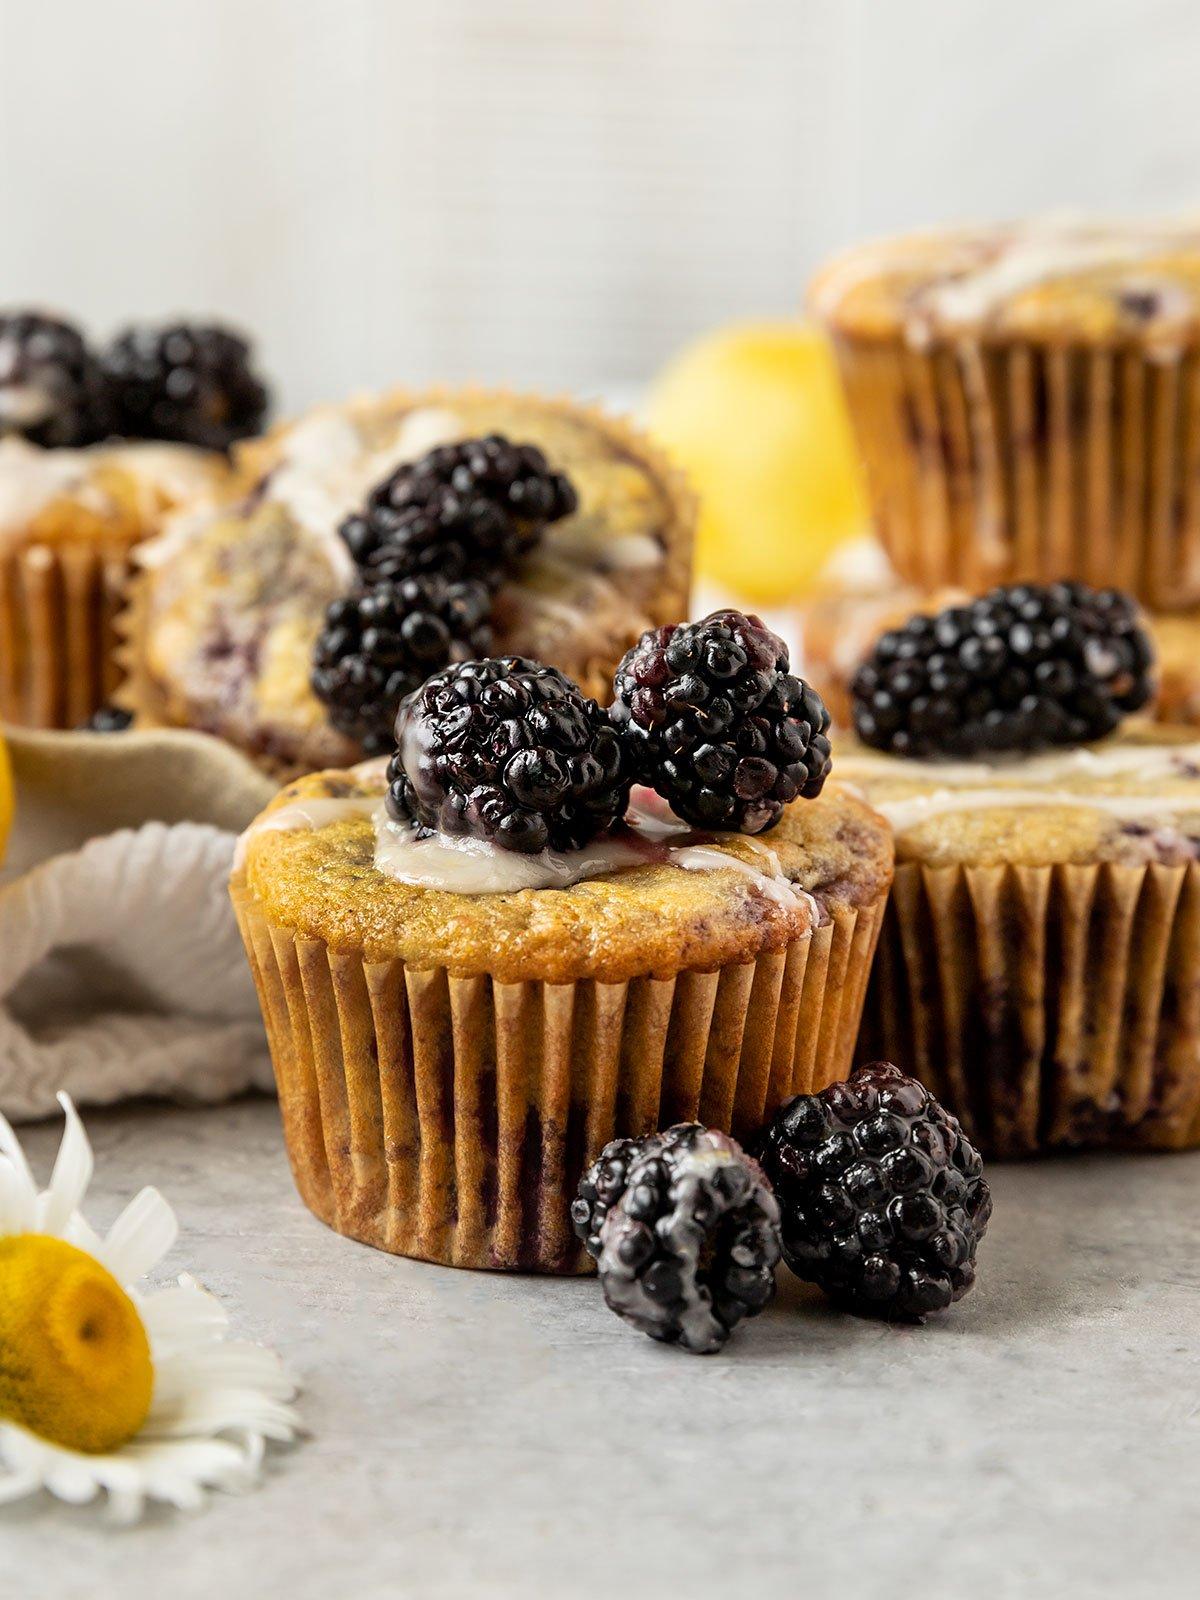 blackberry muffin topped with lemon glaze and fresh blackberries